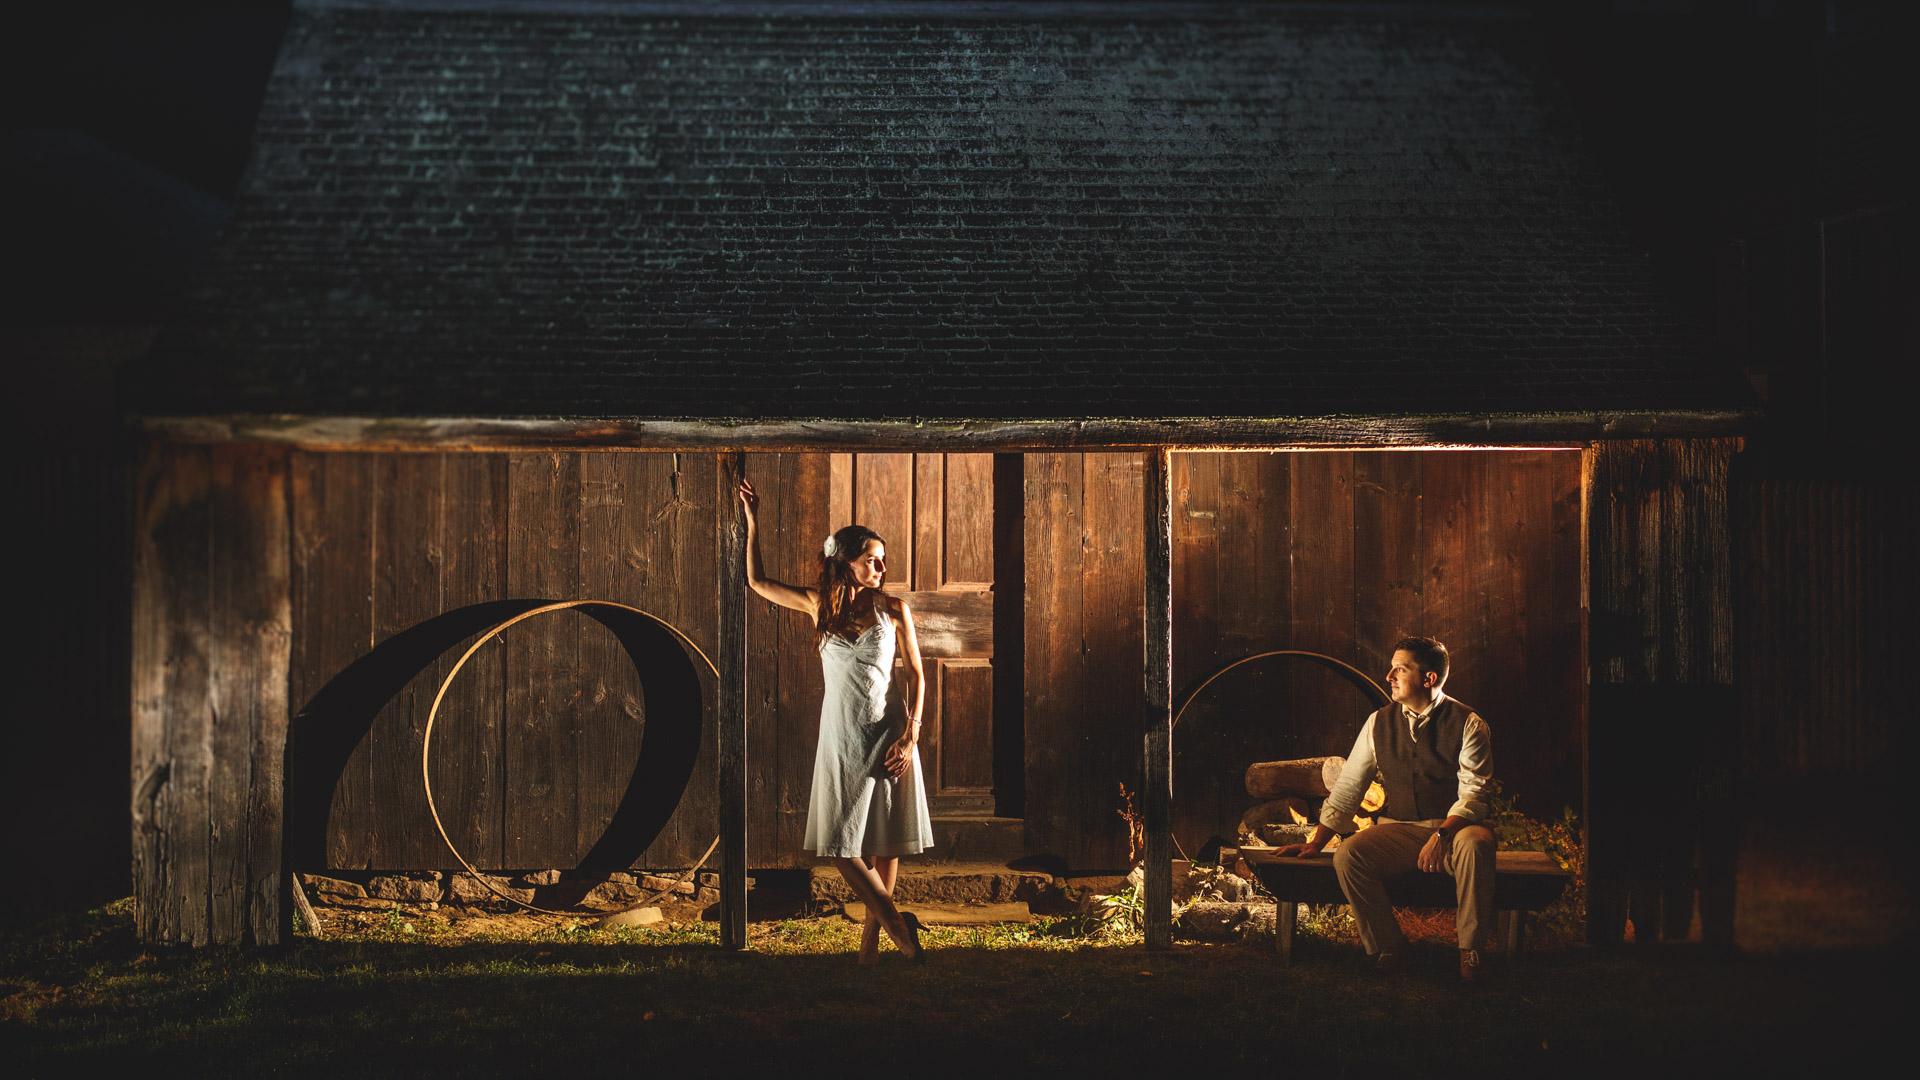 Rustic Wedding Image at Webb Barn Wethersfield.jpg